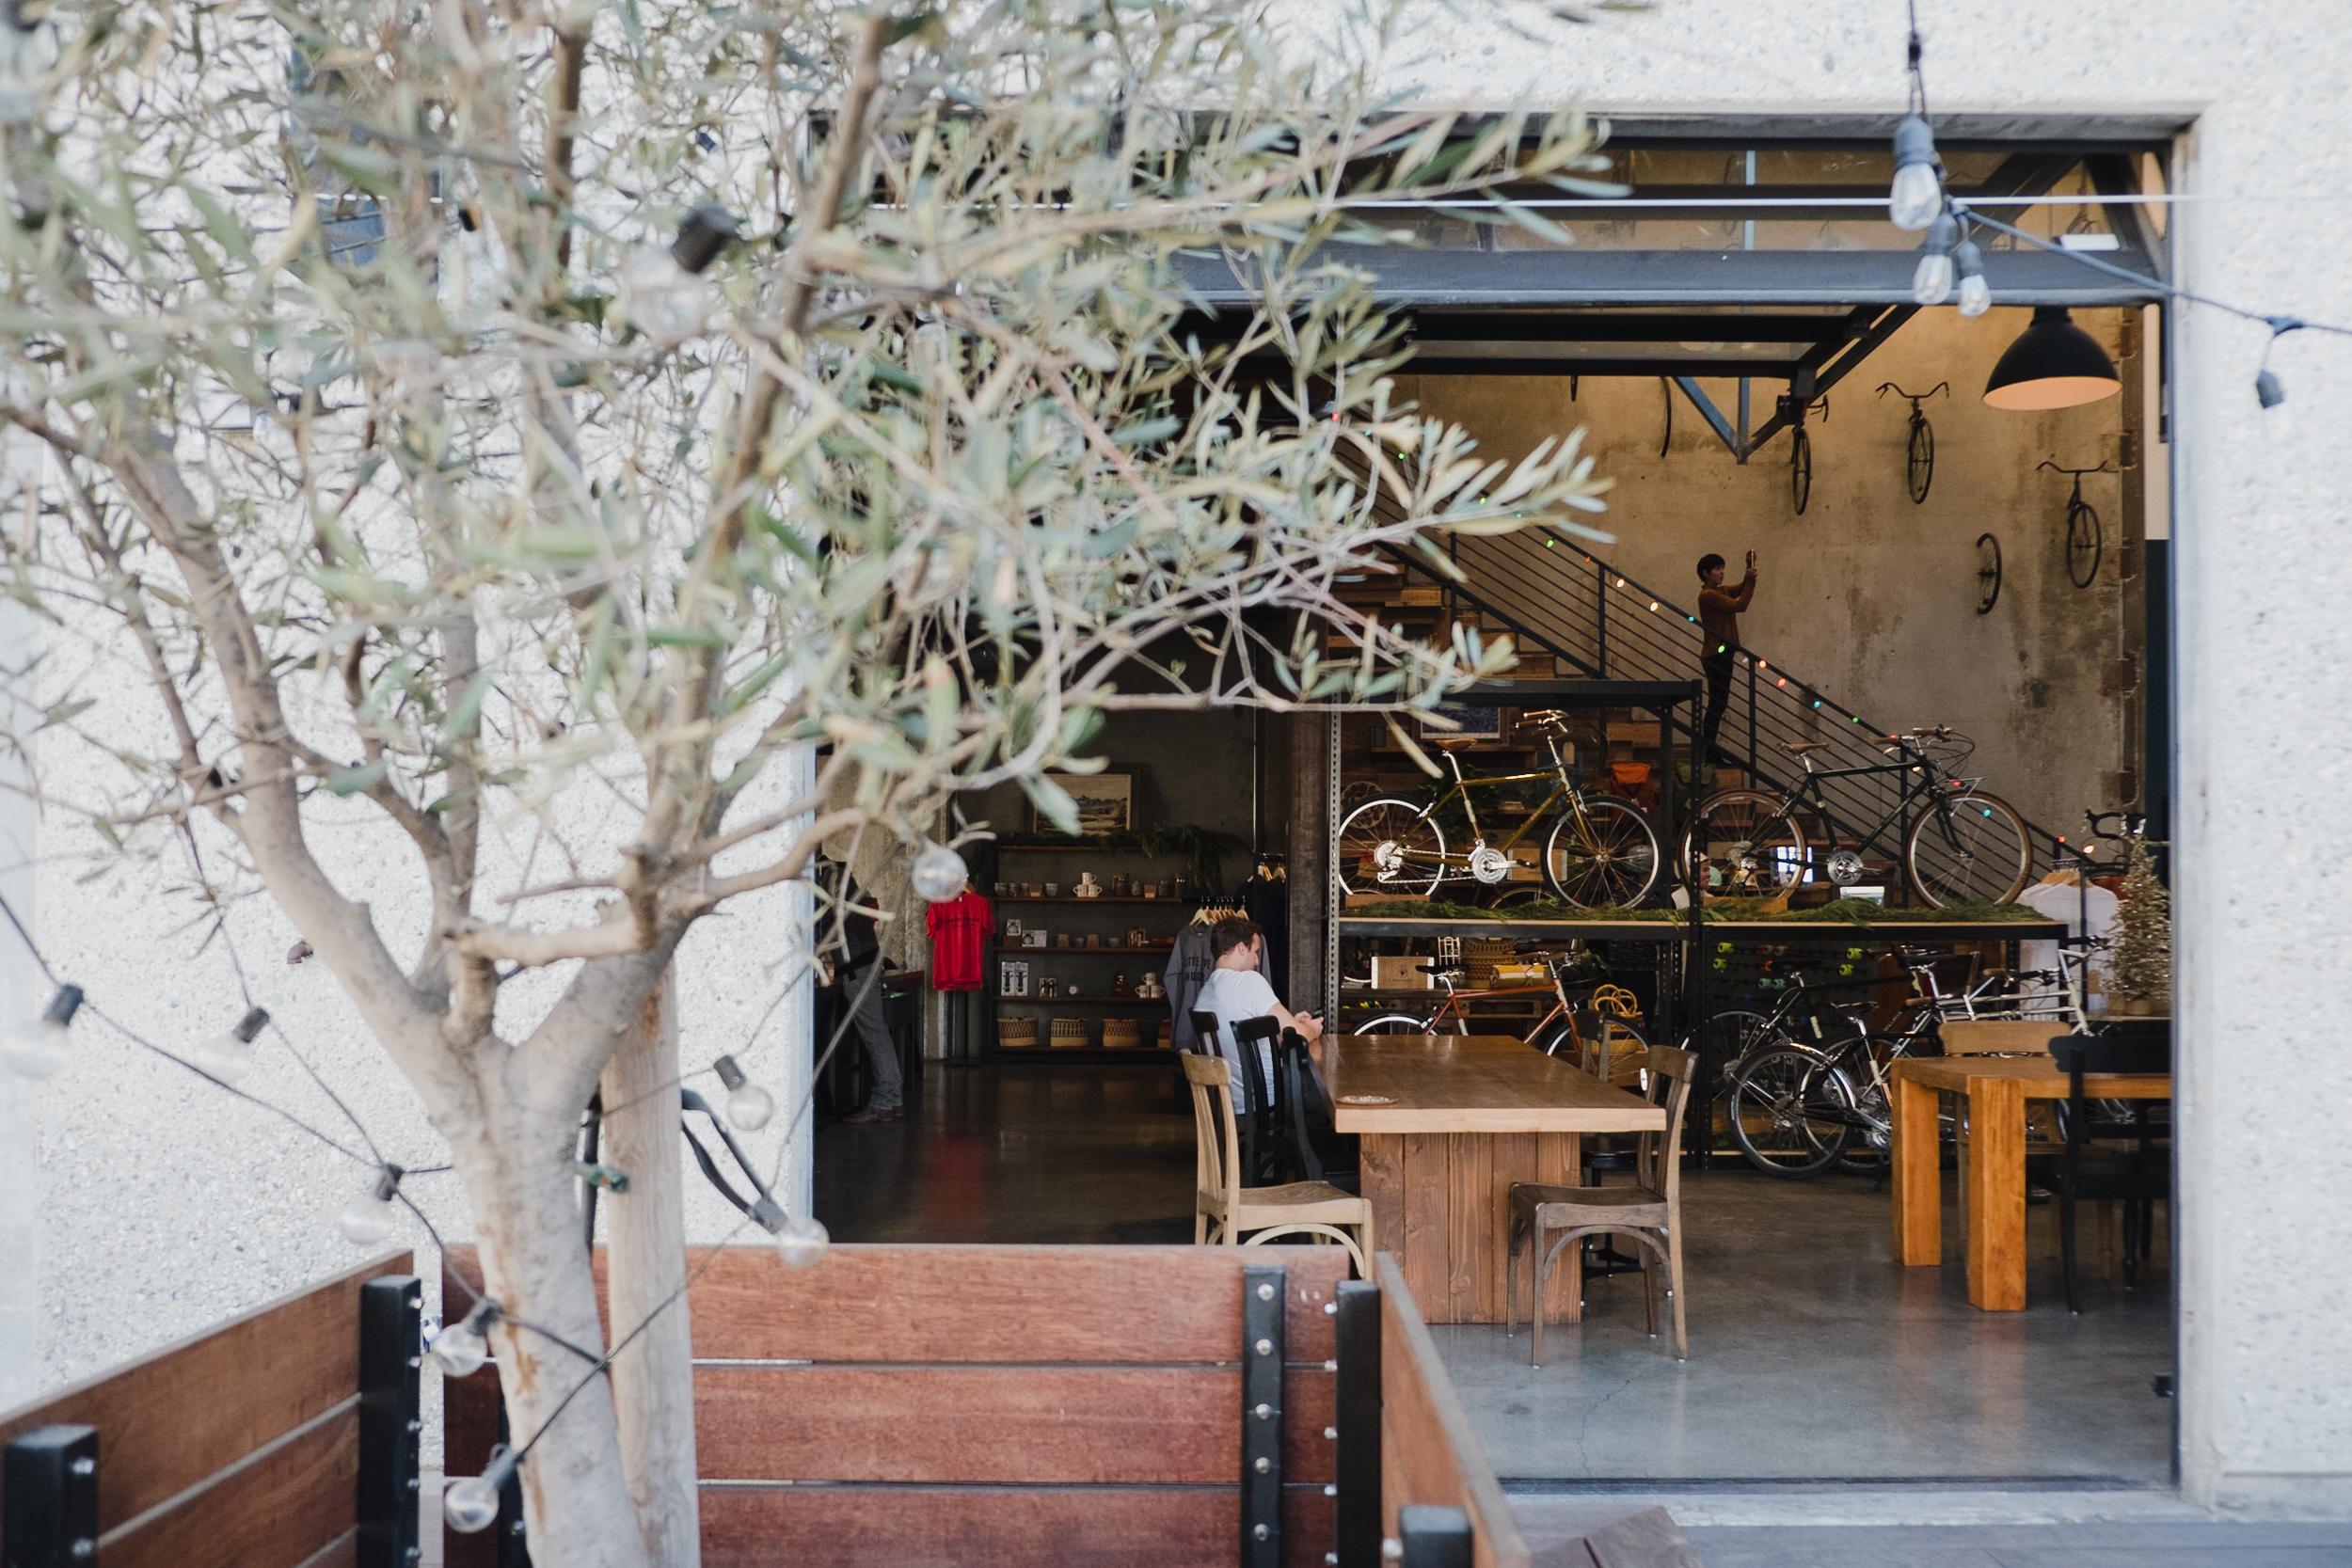 bike-cafe-LA-8061.jpg